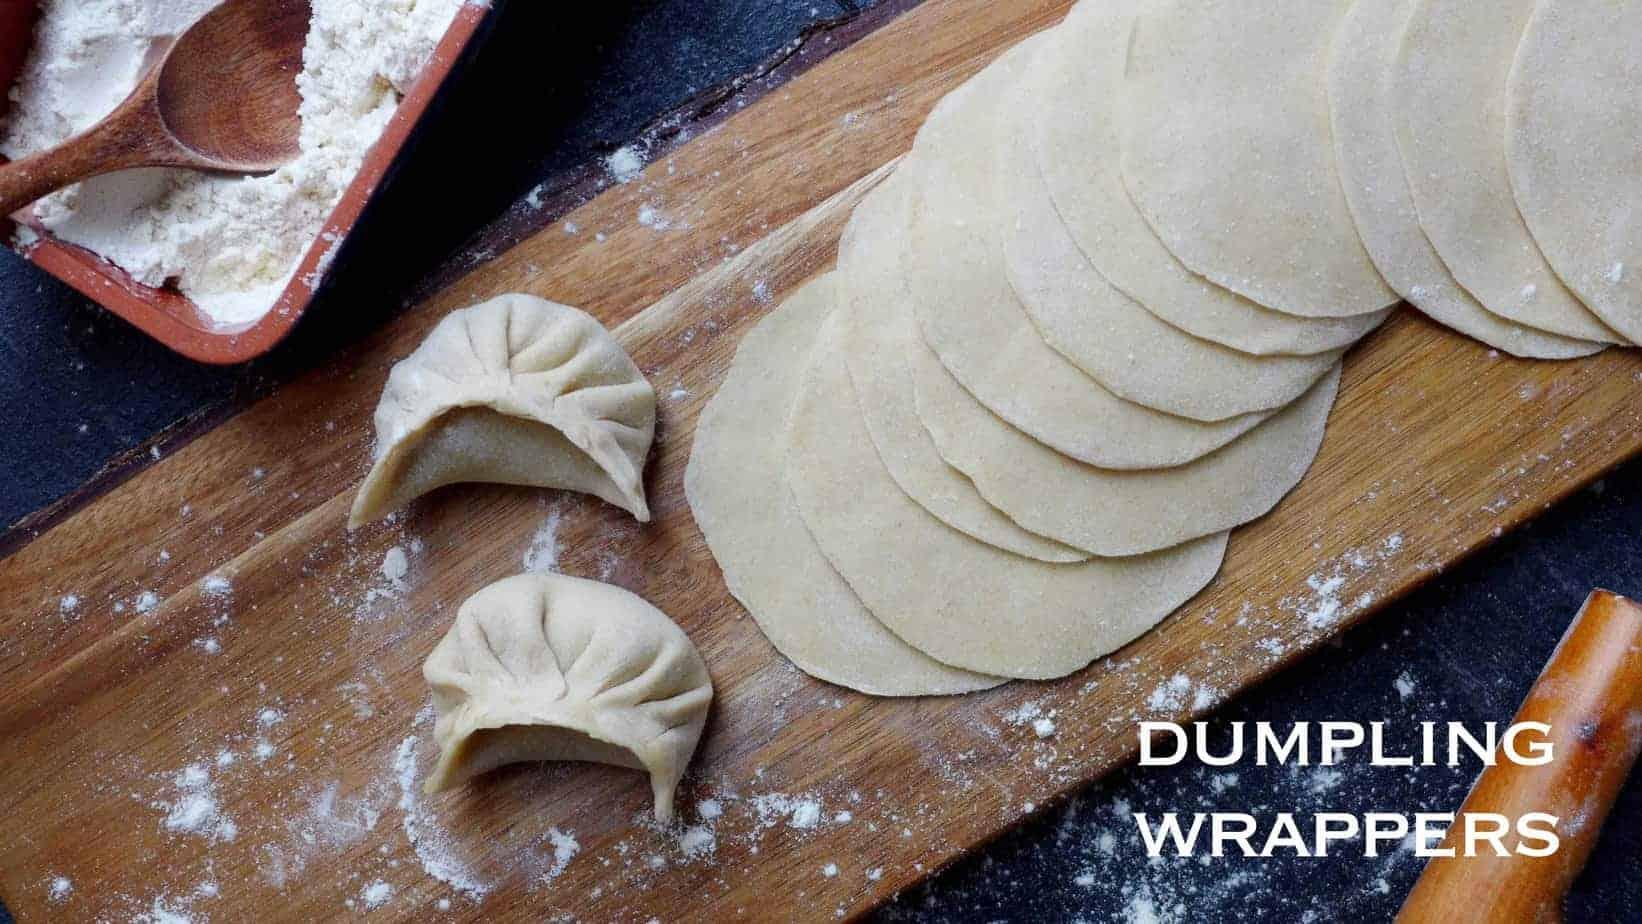 Homemade dumpling wrappers  (饺子皮)